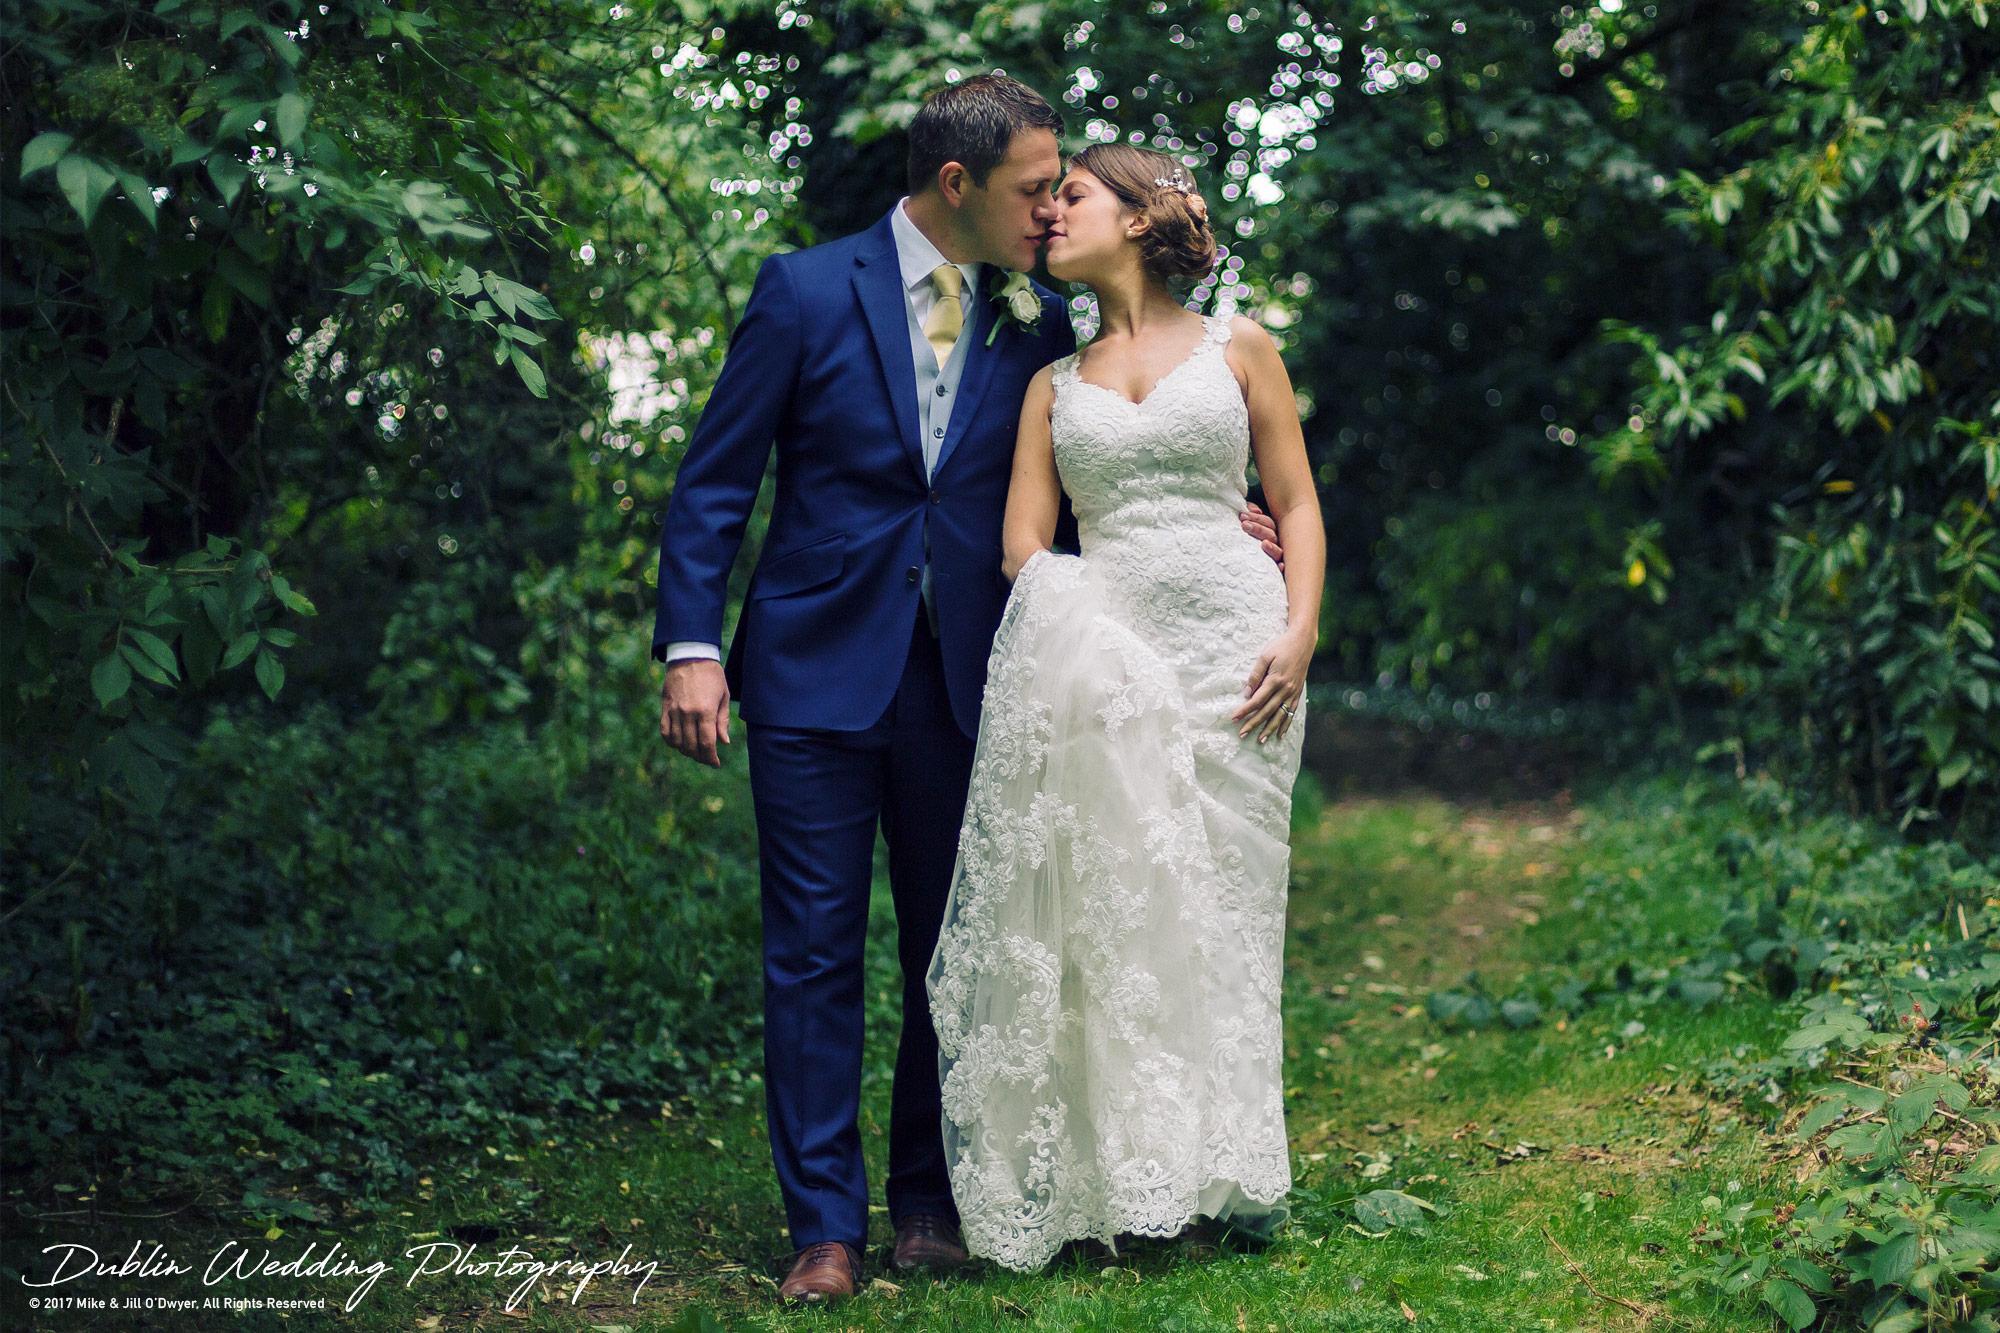 Wedding Photographer Killashee House Hotel Kildare Bride & Groom Kissing in the Woods